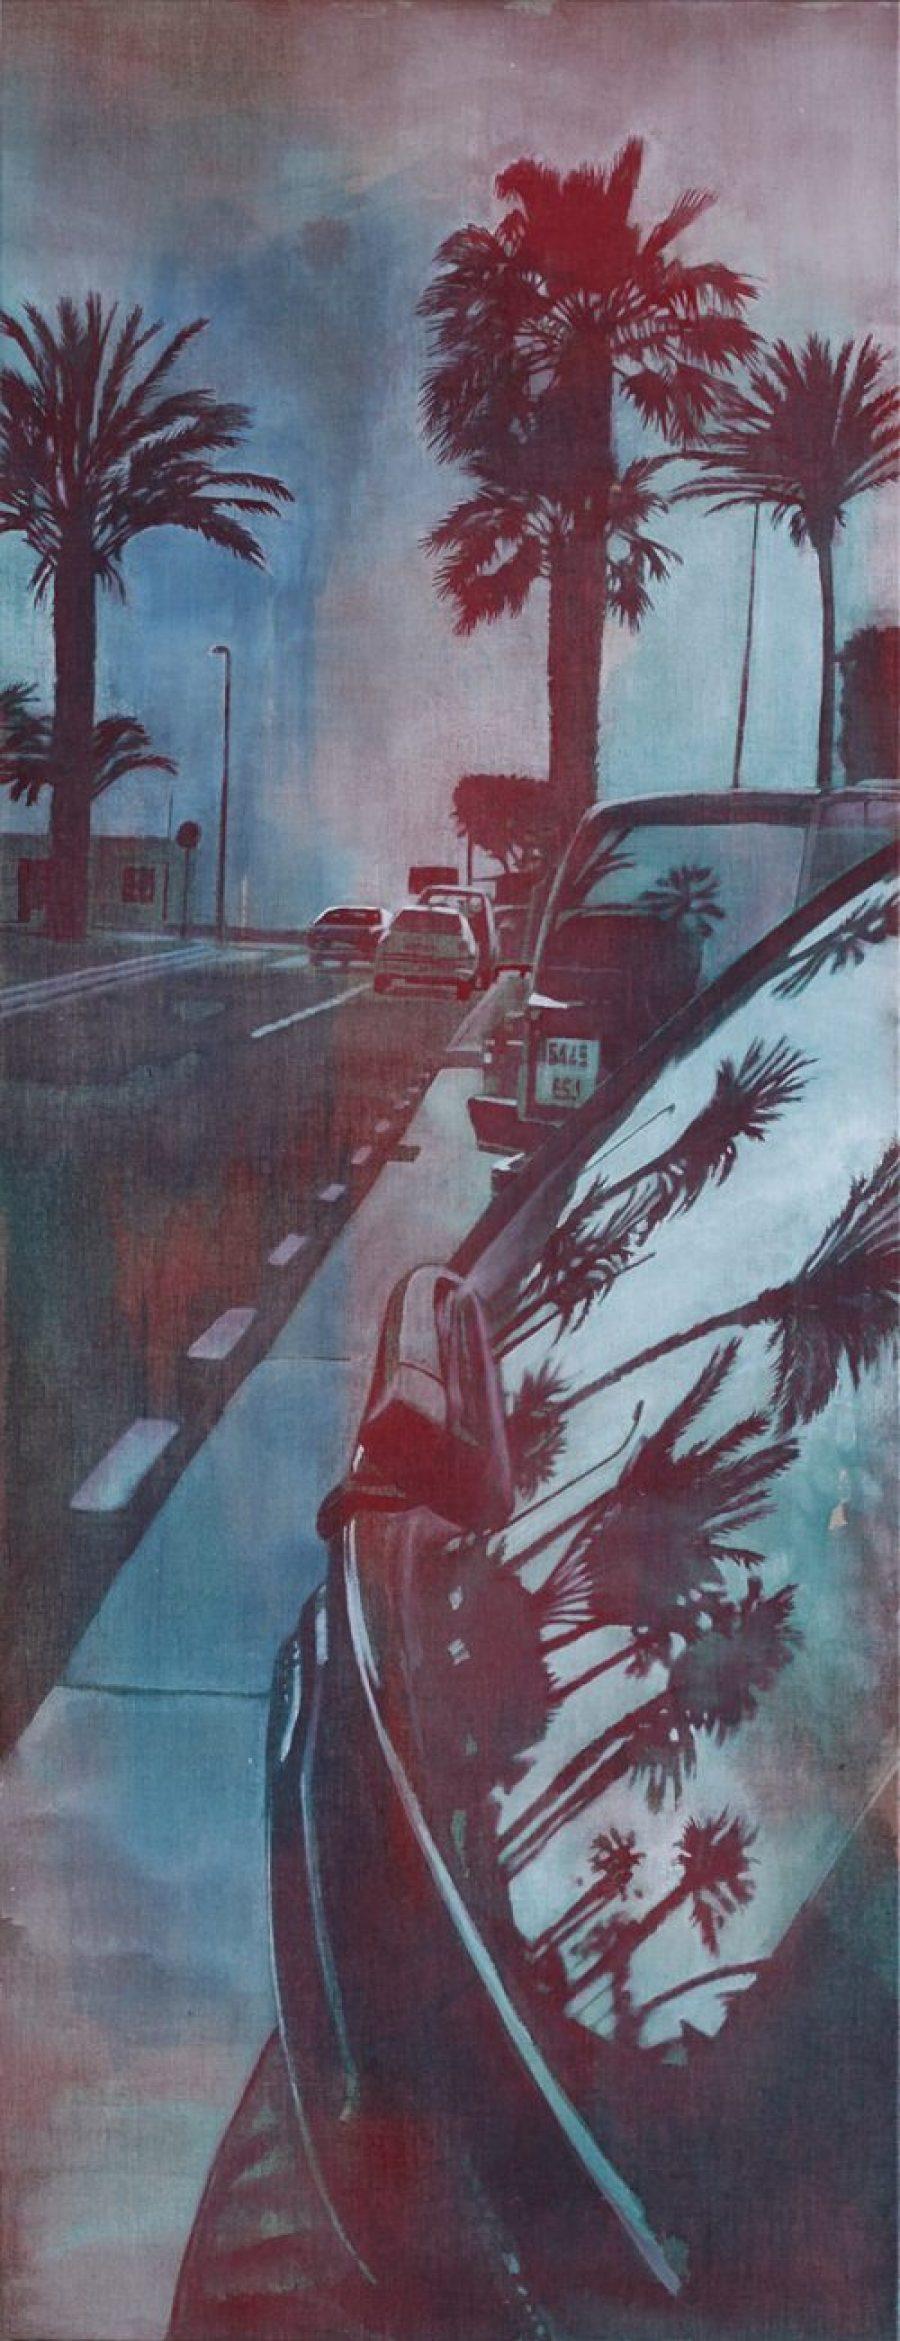 Life in a window #3   |   161 x 62 cm